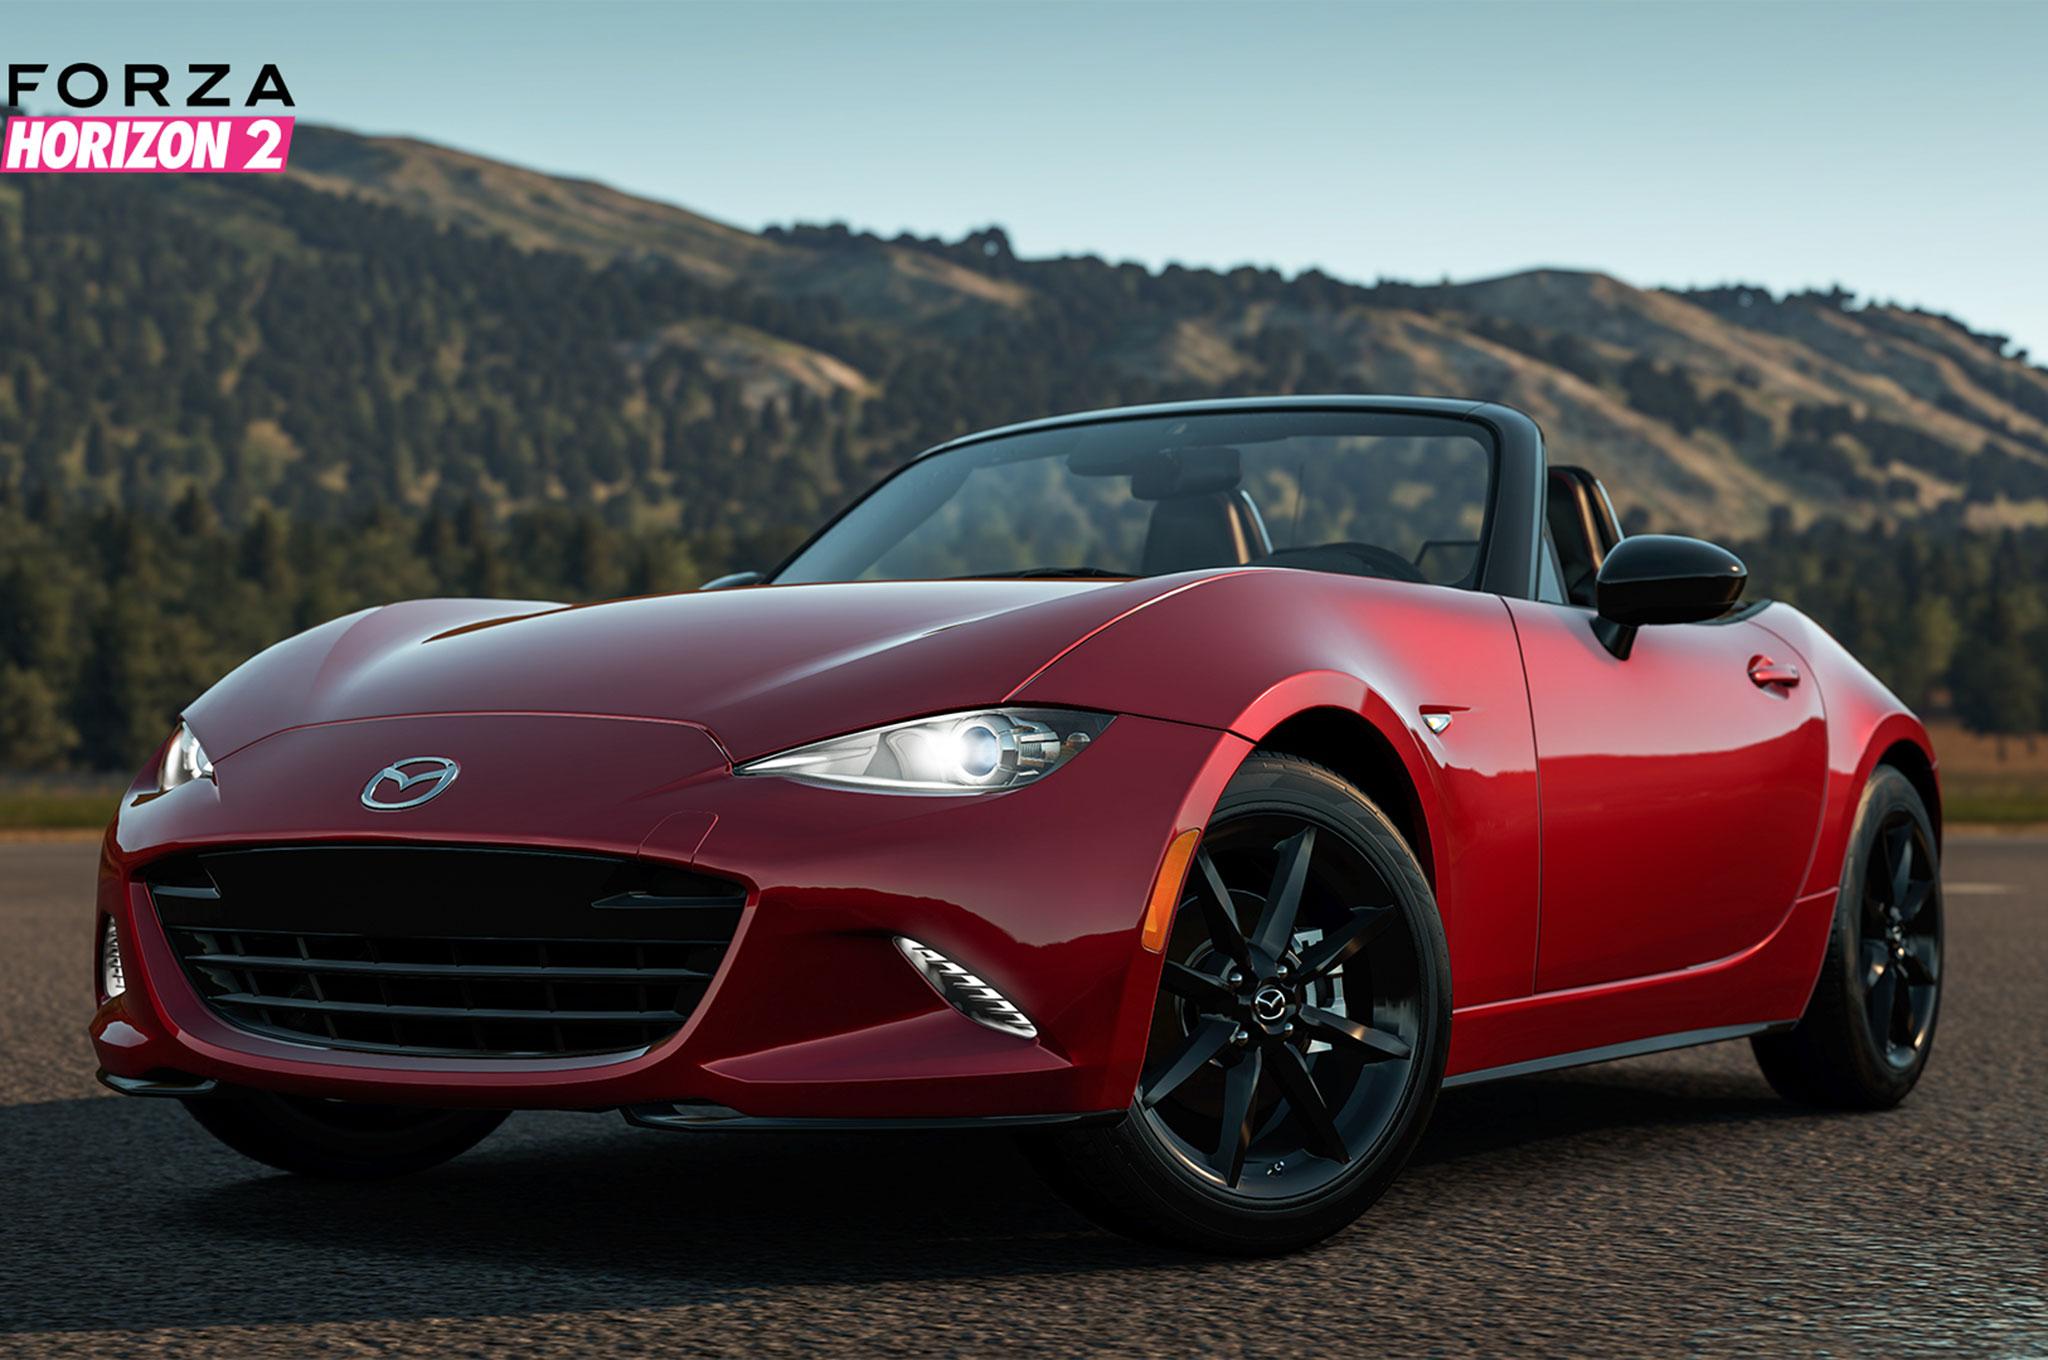 http://st.automobilemag.com/uploads/sites/10/2015/09/2016-Mazda-MX-5-Miata-in-Forza-Horizon-2-front-three-quarter.jpg